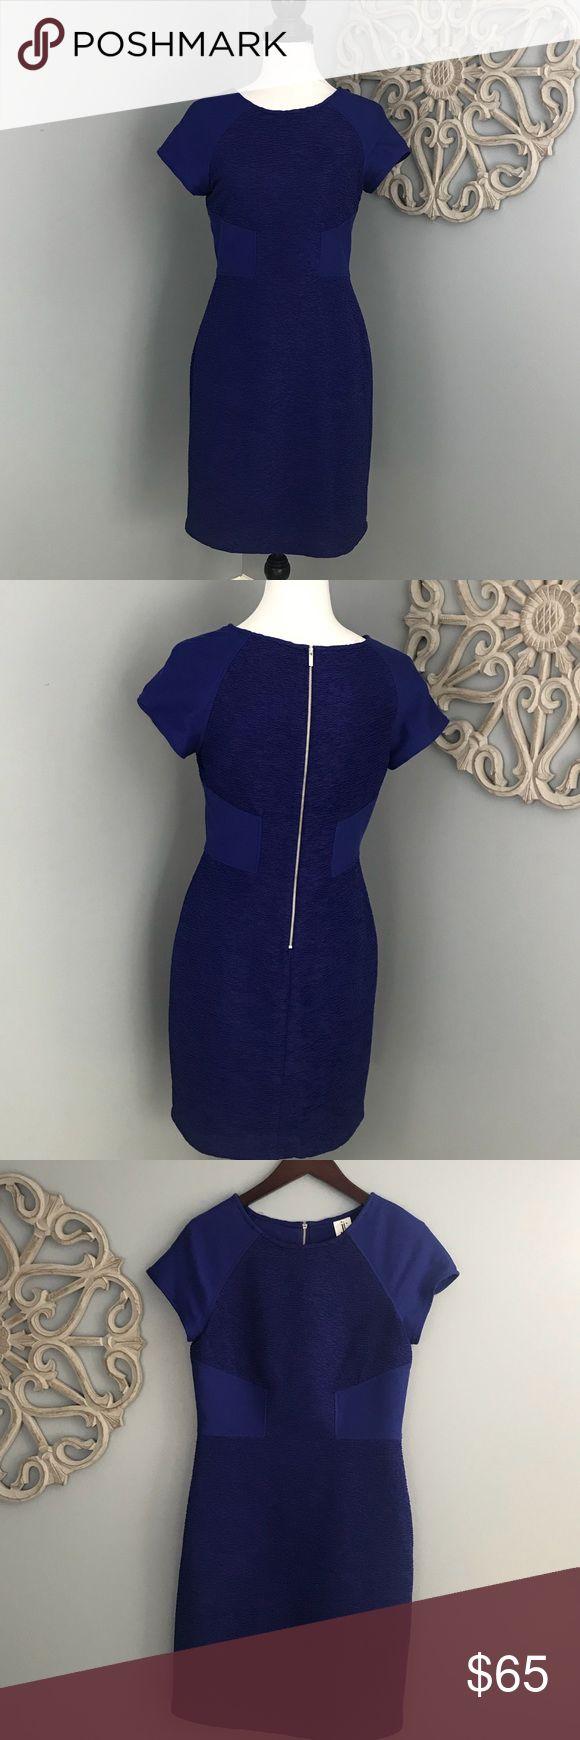 Julia Jordan | Textured Royal Blue Dress Textured royal blue dress by Julia Jordan.   Cap sleeves.  EUC. No rips, stains, tears or snags. Julia Jordan Dresses Midi